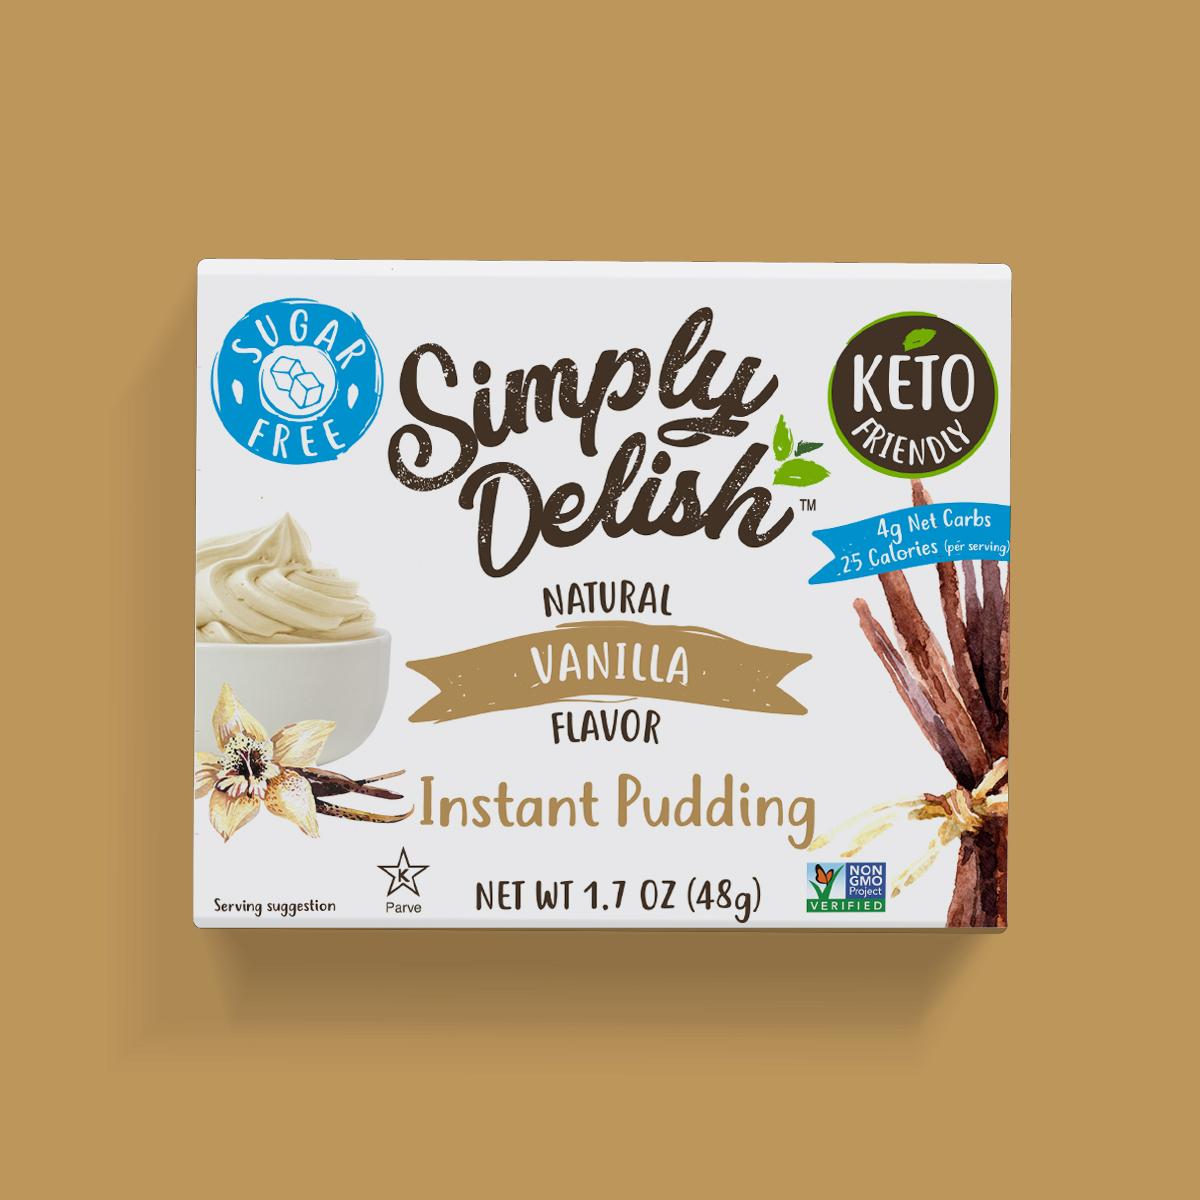 Simply Delish Keto Friendly vegan Vanilla Pudding